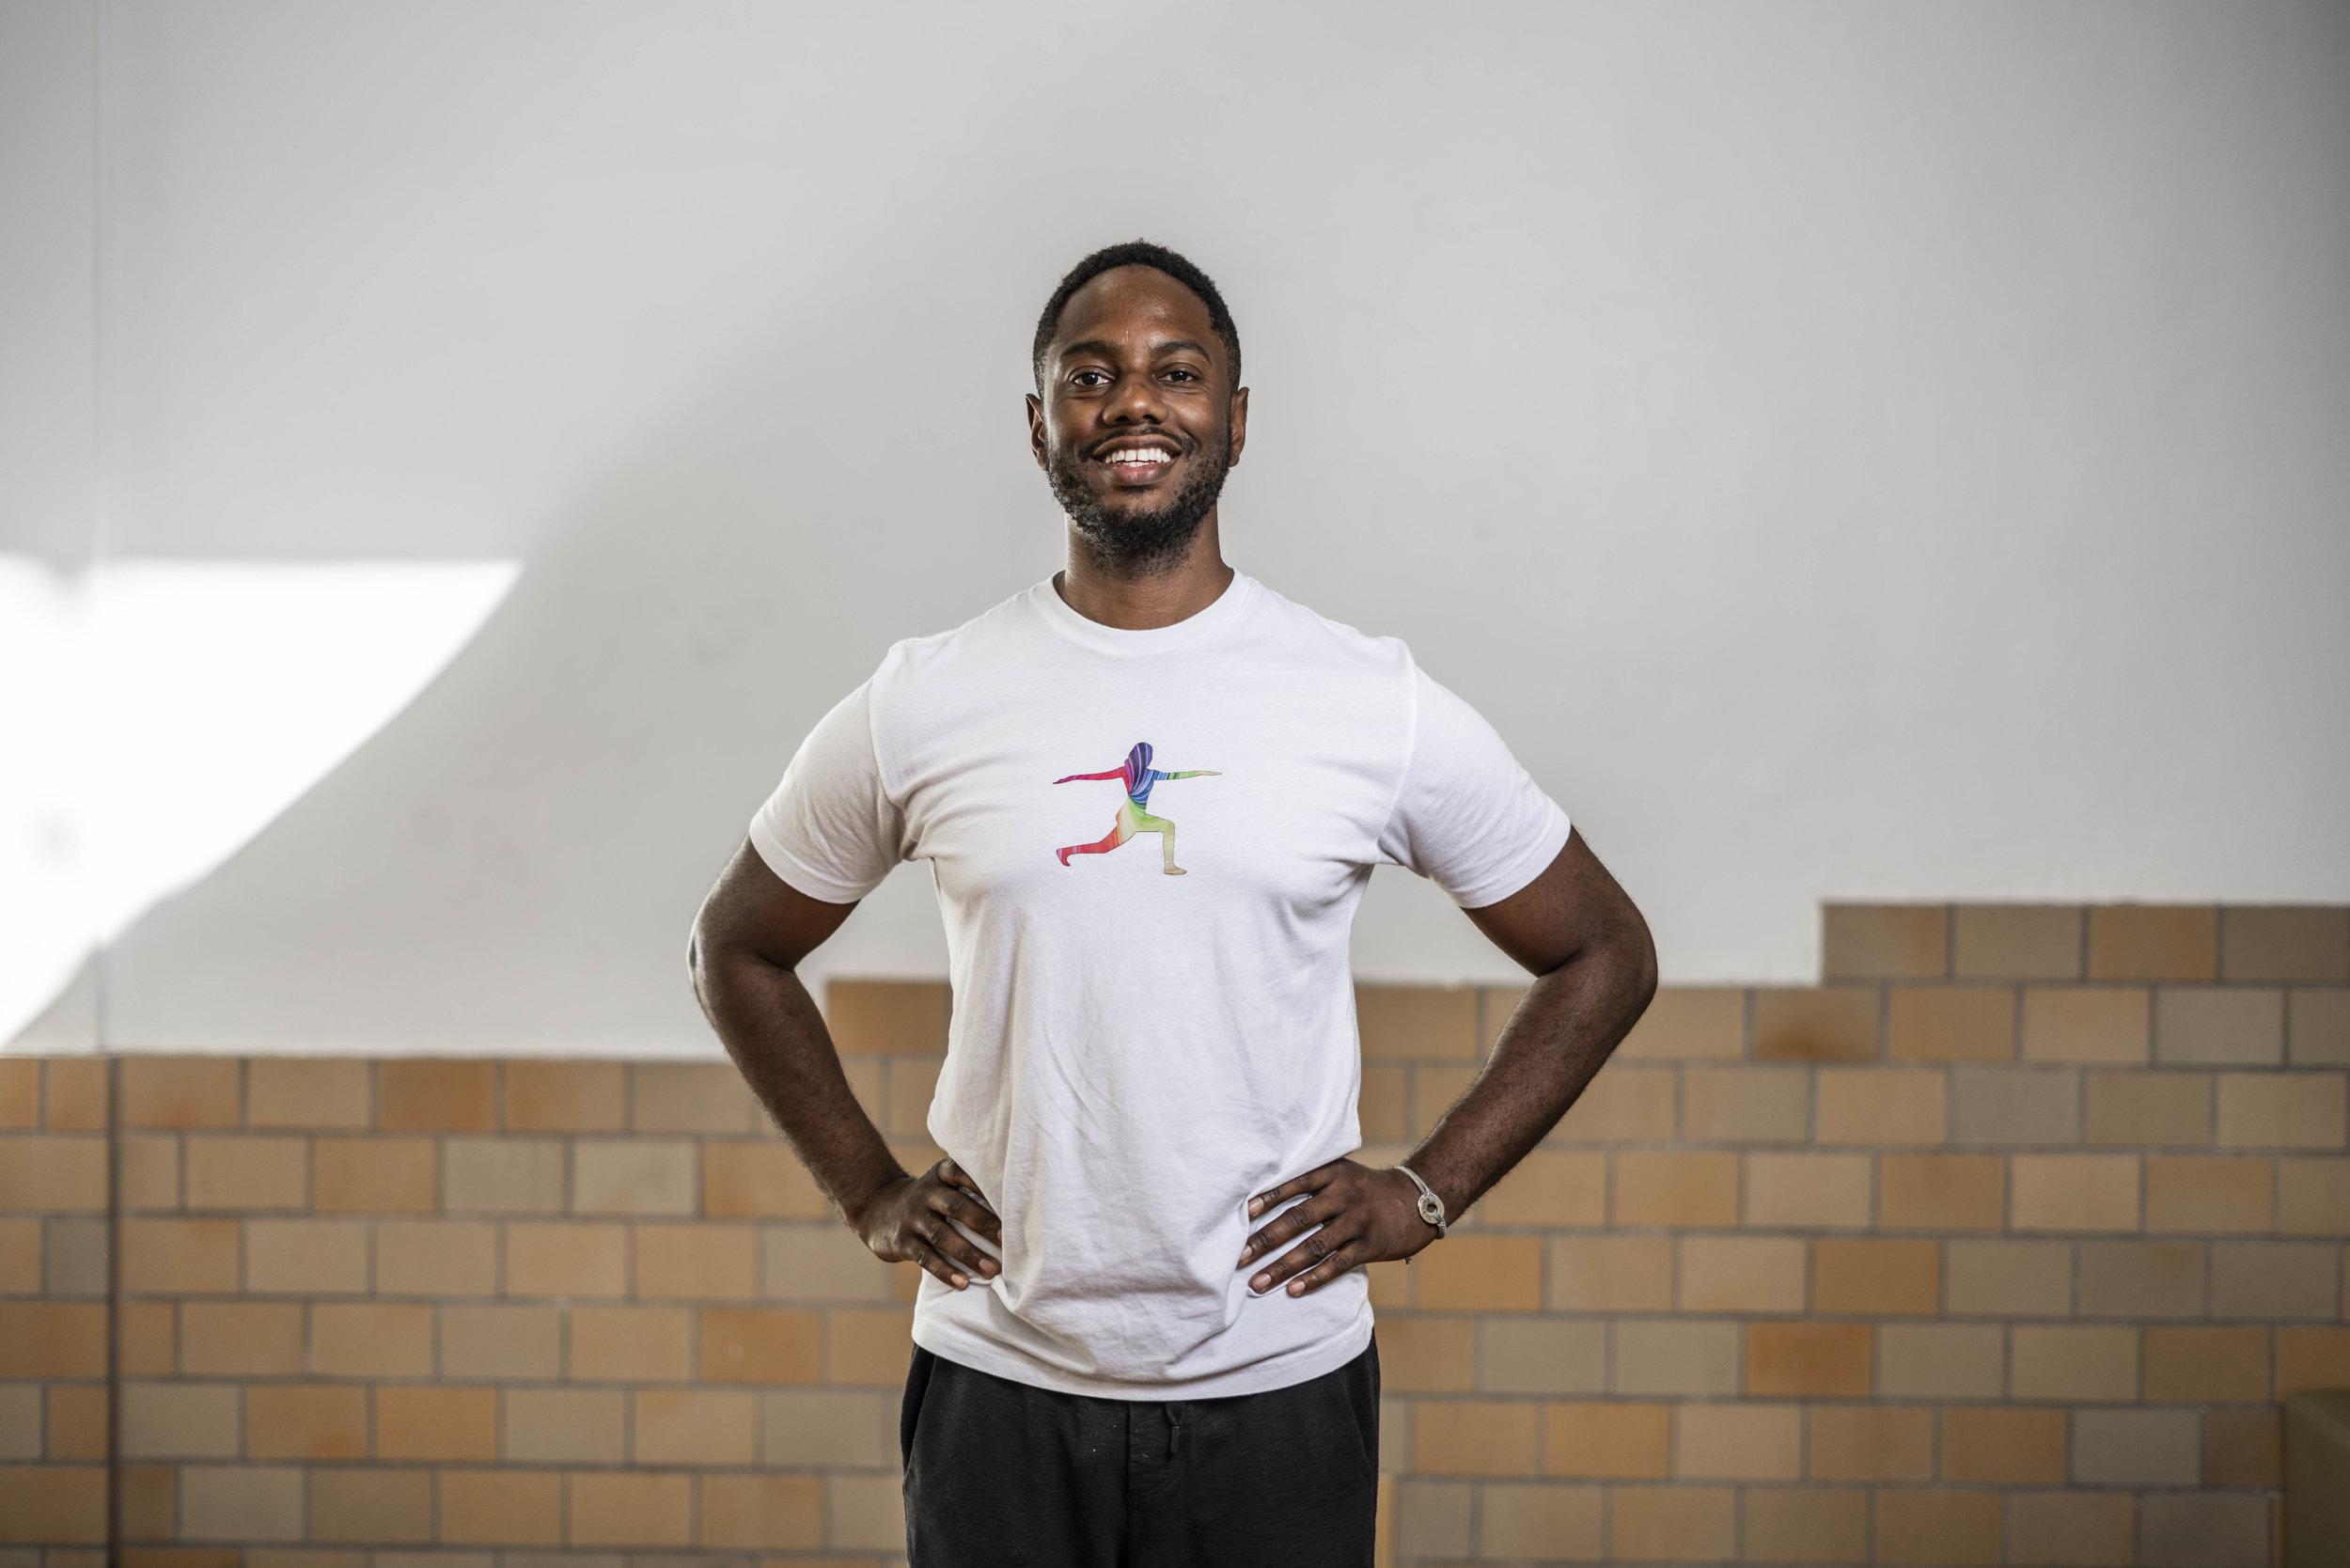 Jason Williams/Charm City PT founder of Pilates Barre Training